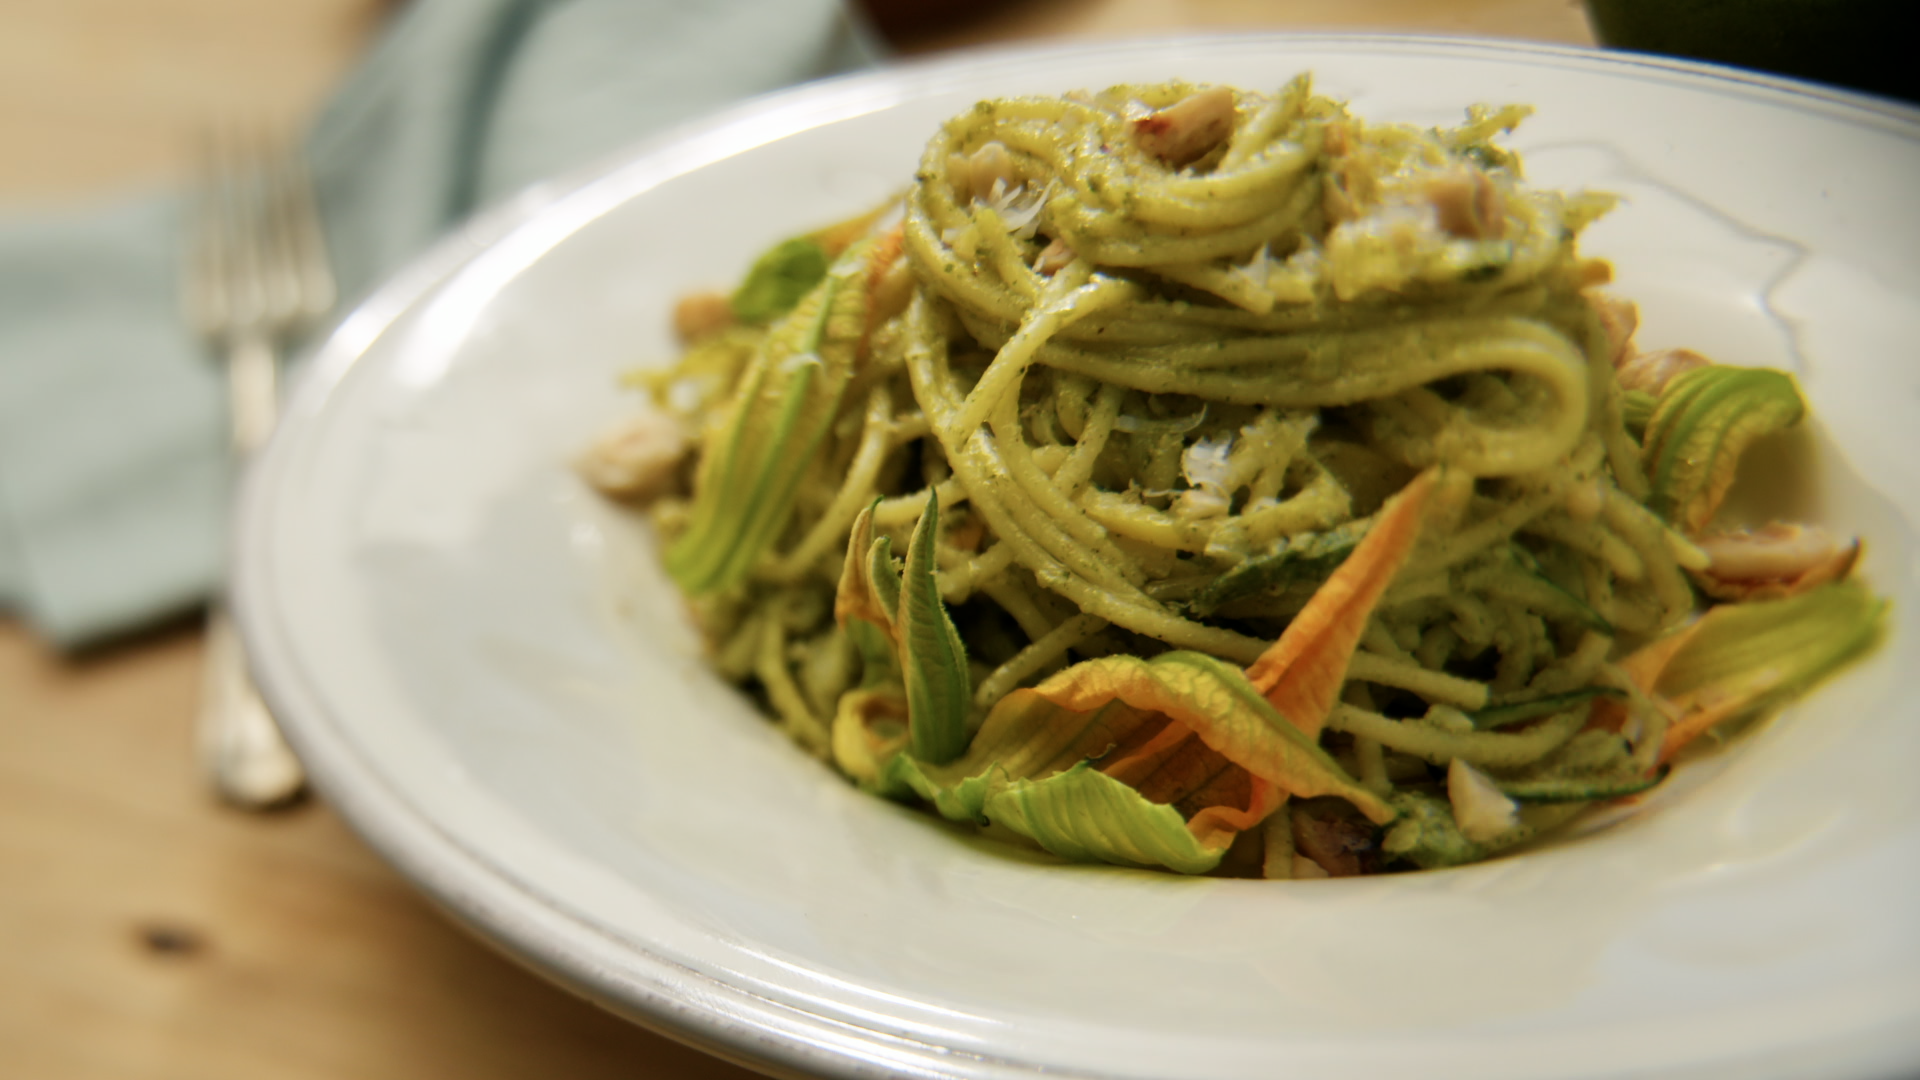 Zucchini and Pesto Pasta